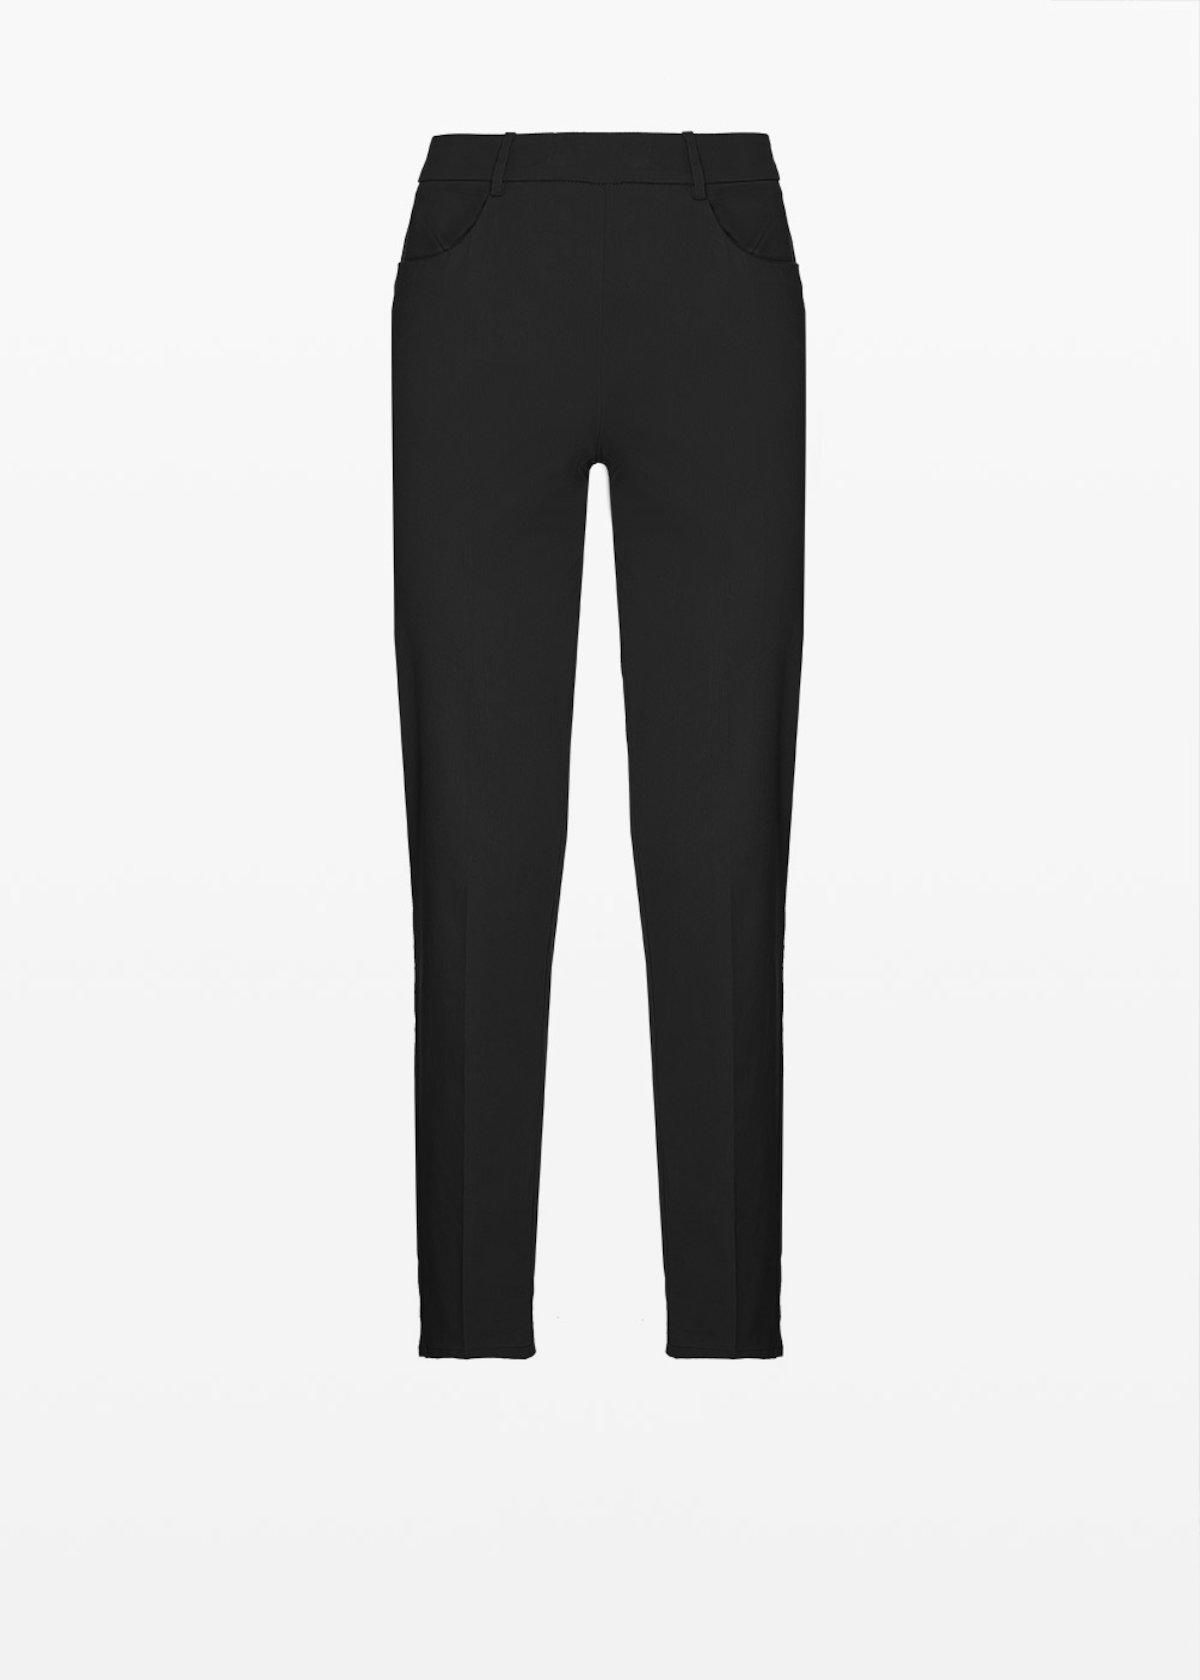 Scarlett C cotton trousers - Black - Woman